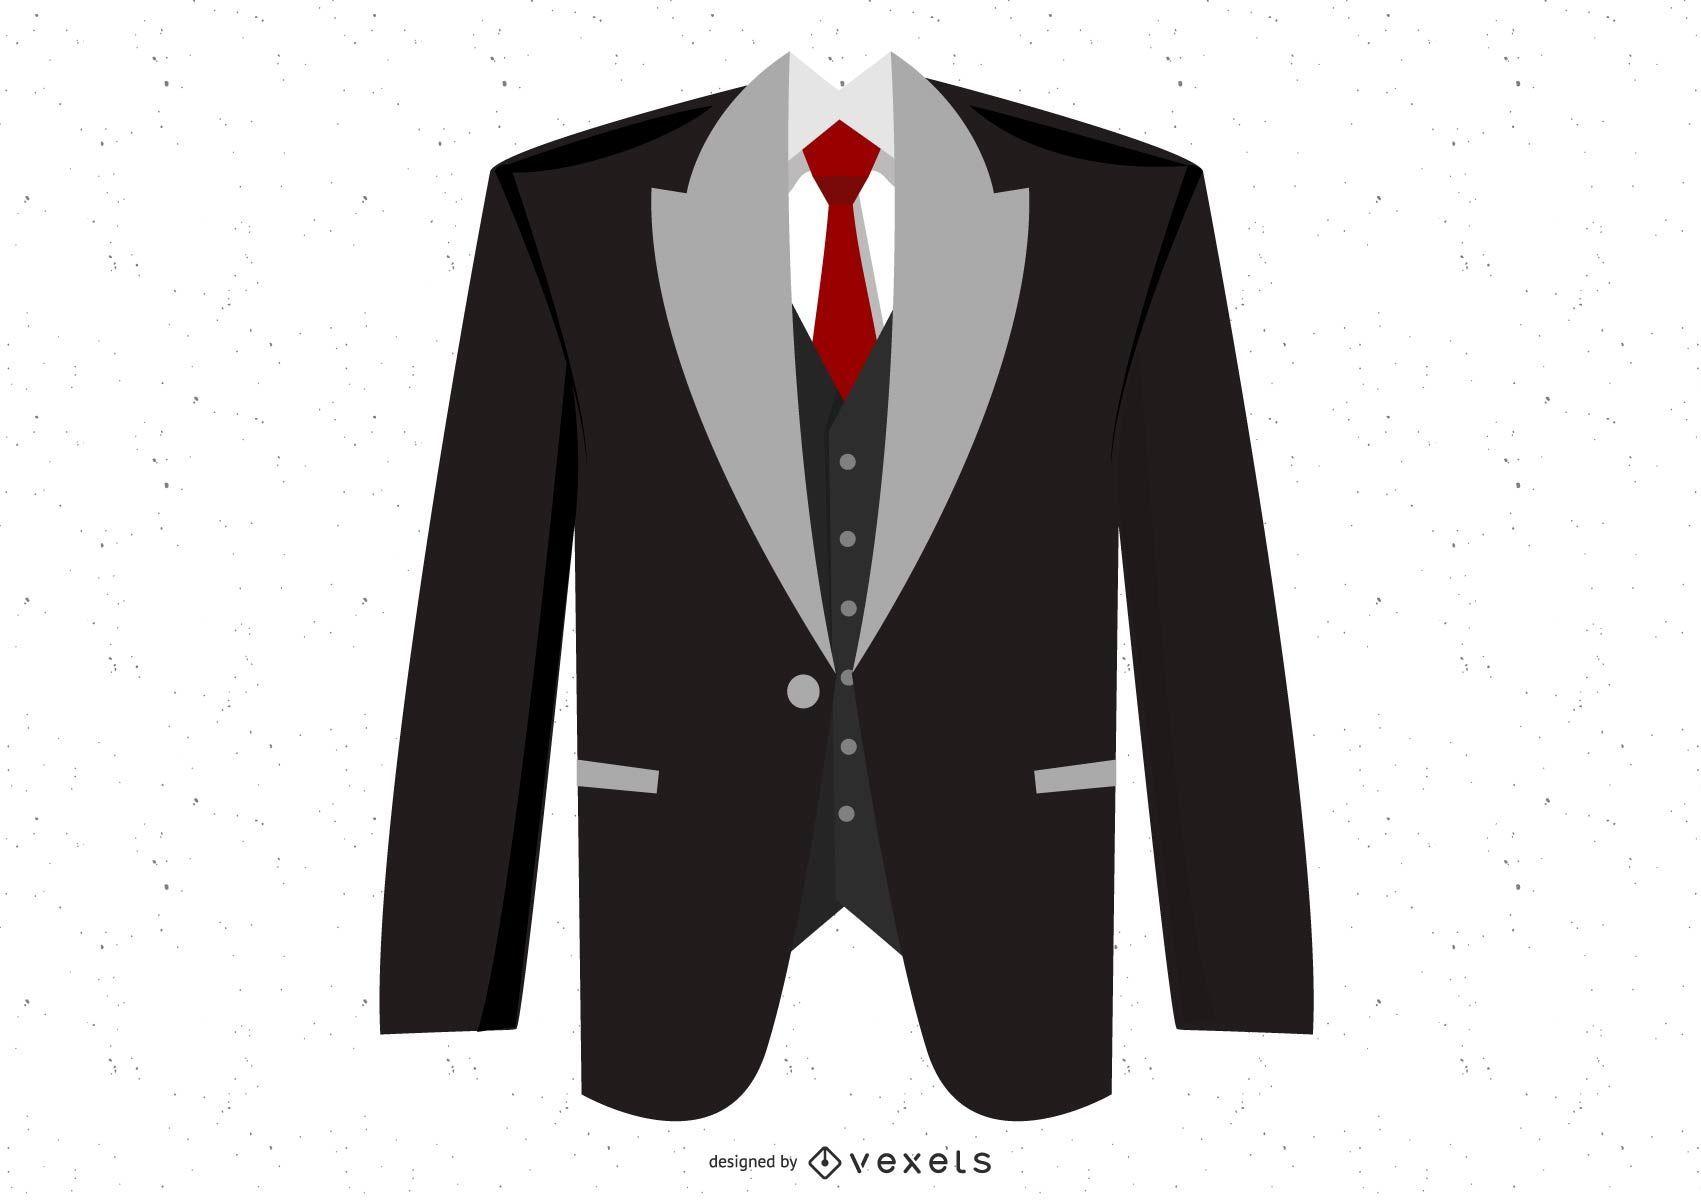 Black suit illustration design